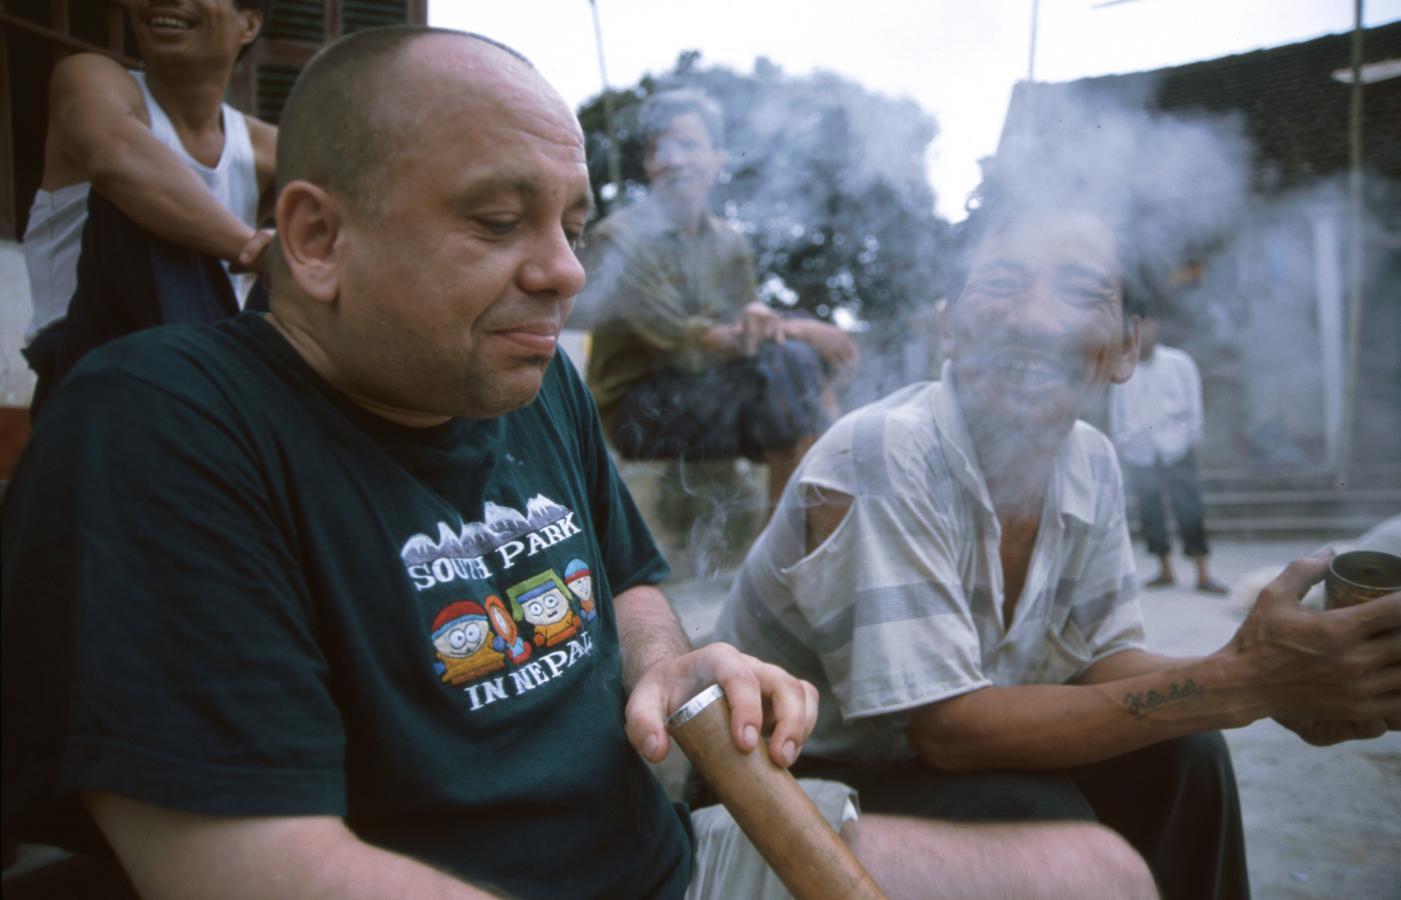 smoking-strong-tabacco-at-6-am, Vietnam, 2002